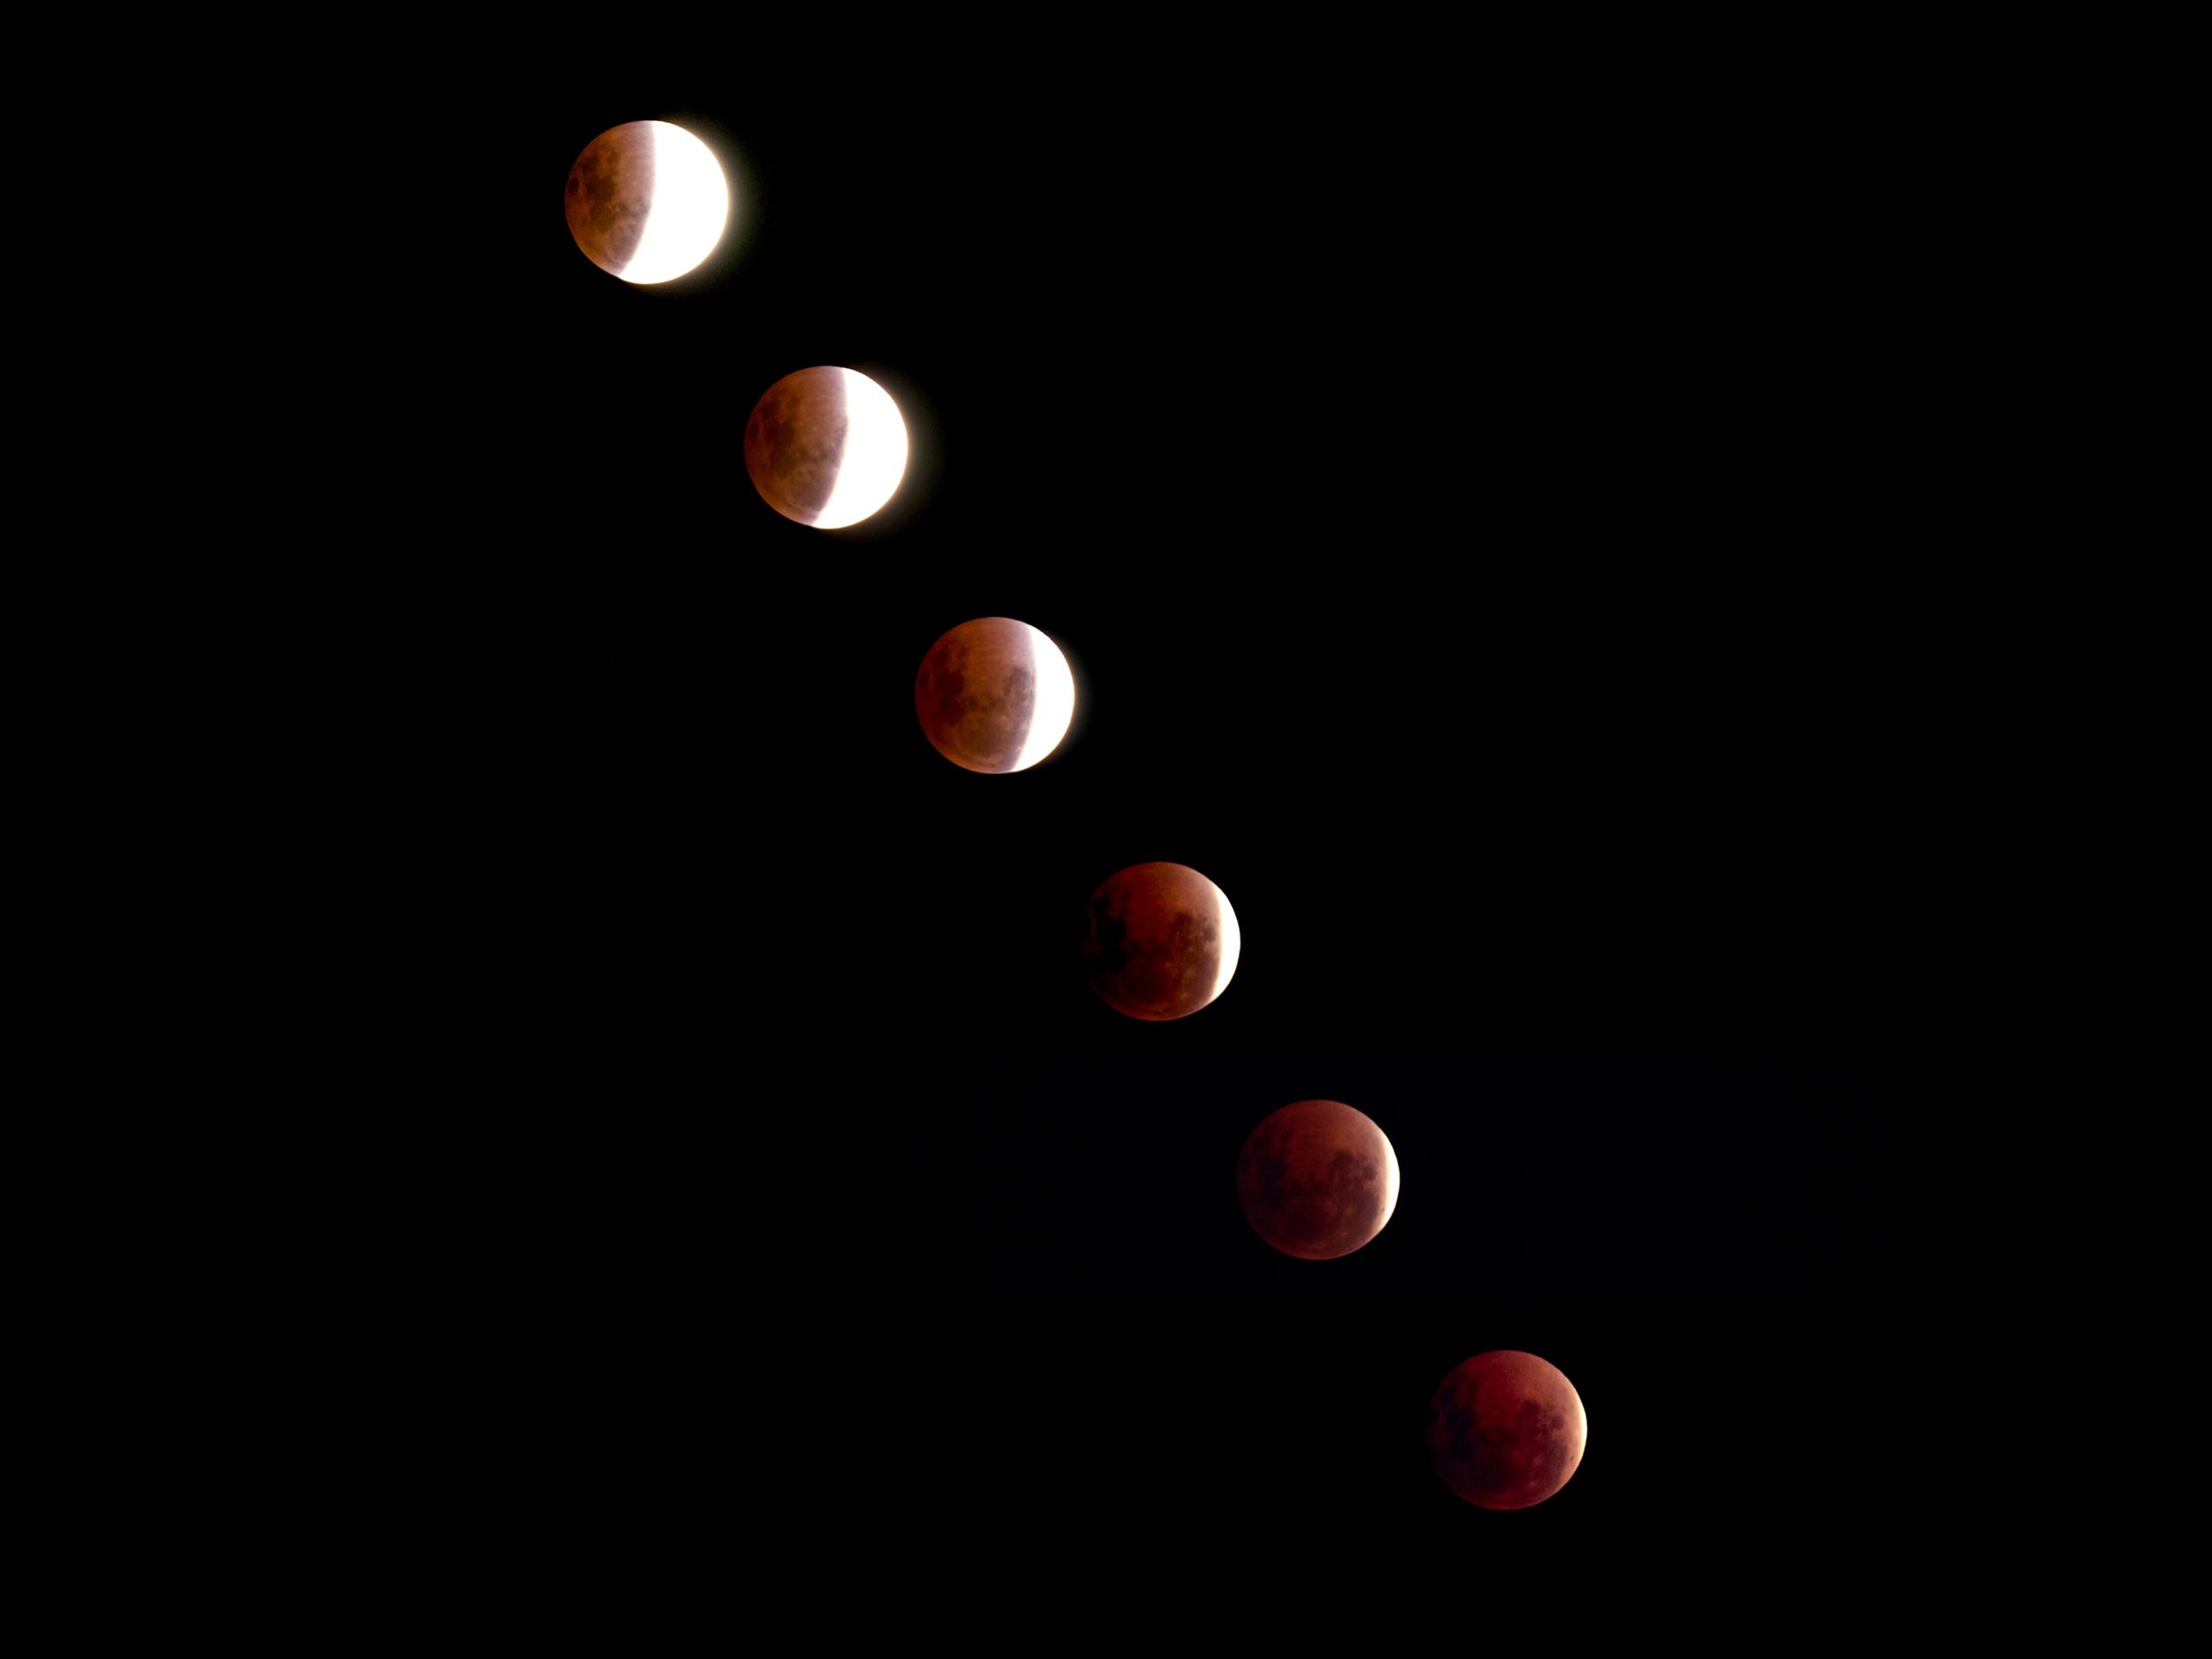 Blood Moon - April 15, 2014.